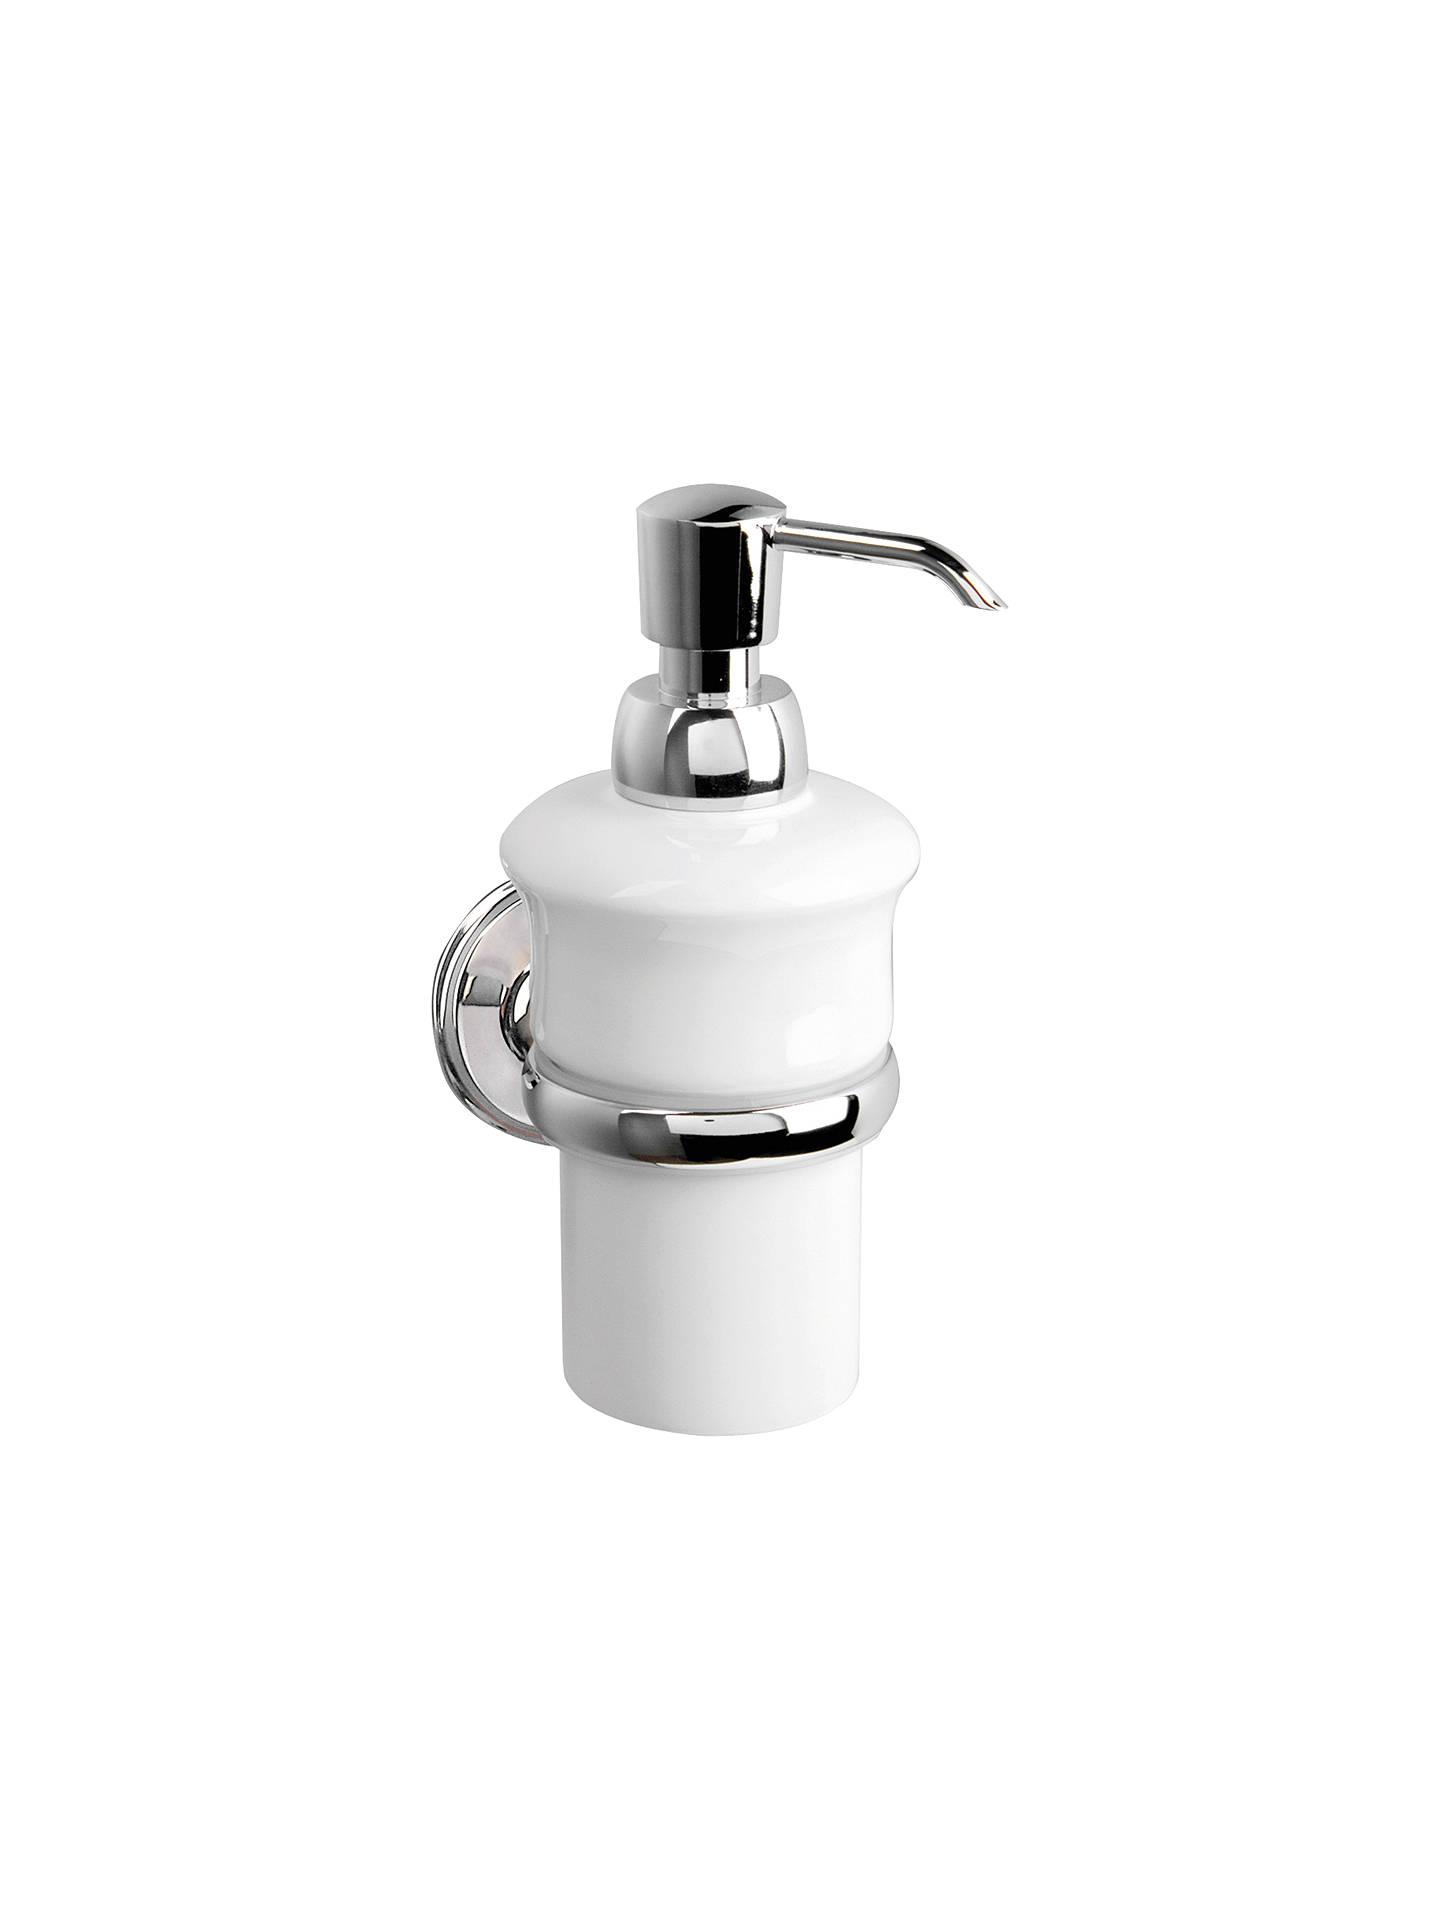 Miller Stockholm Ceramic Wall Mounted Soap Dispenser And Holder At